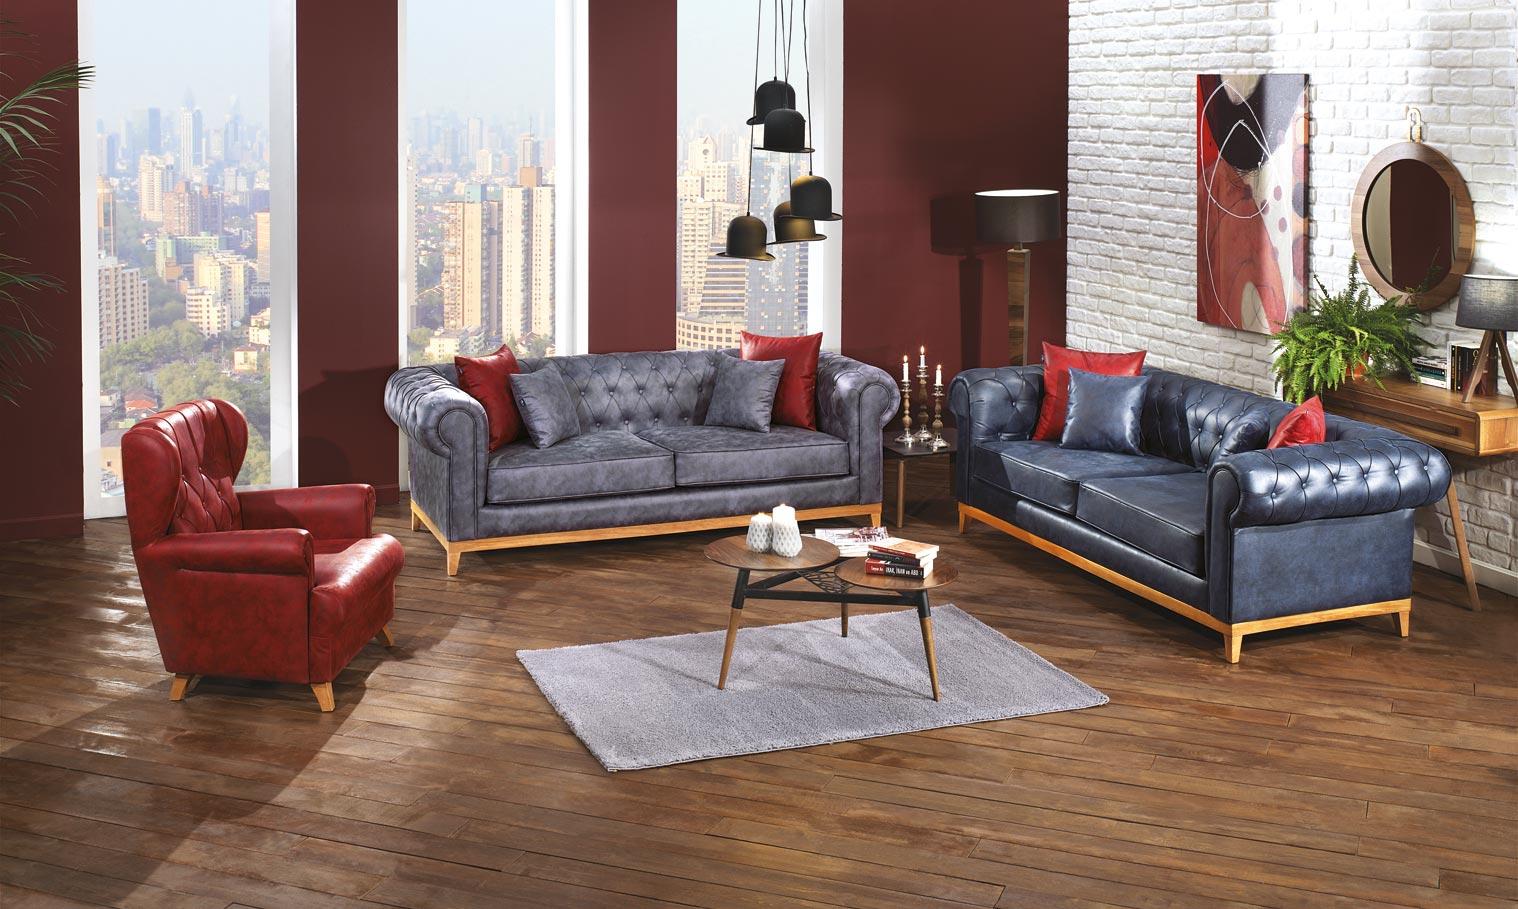 Castello milano sofa set & bergere armchair